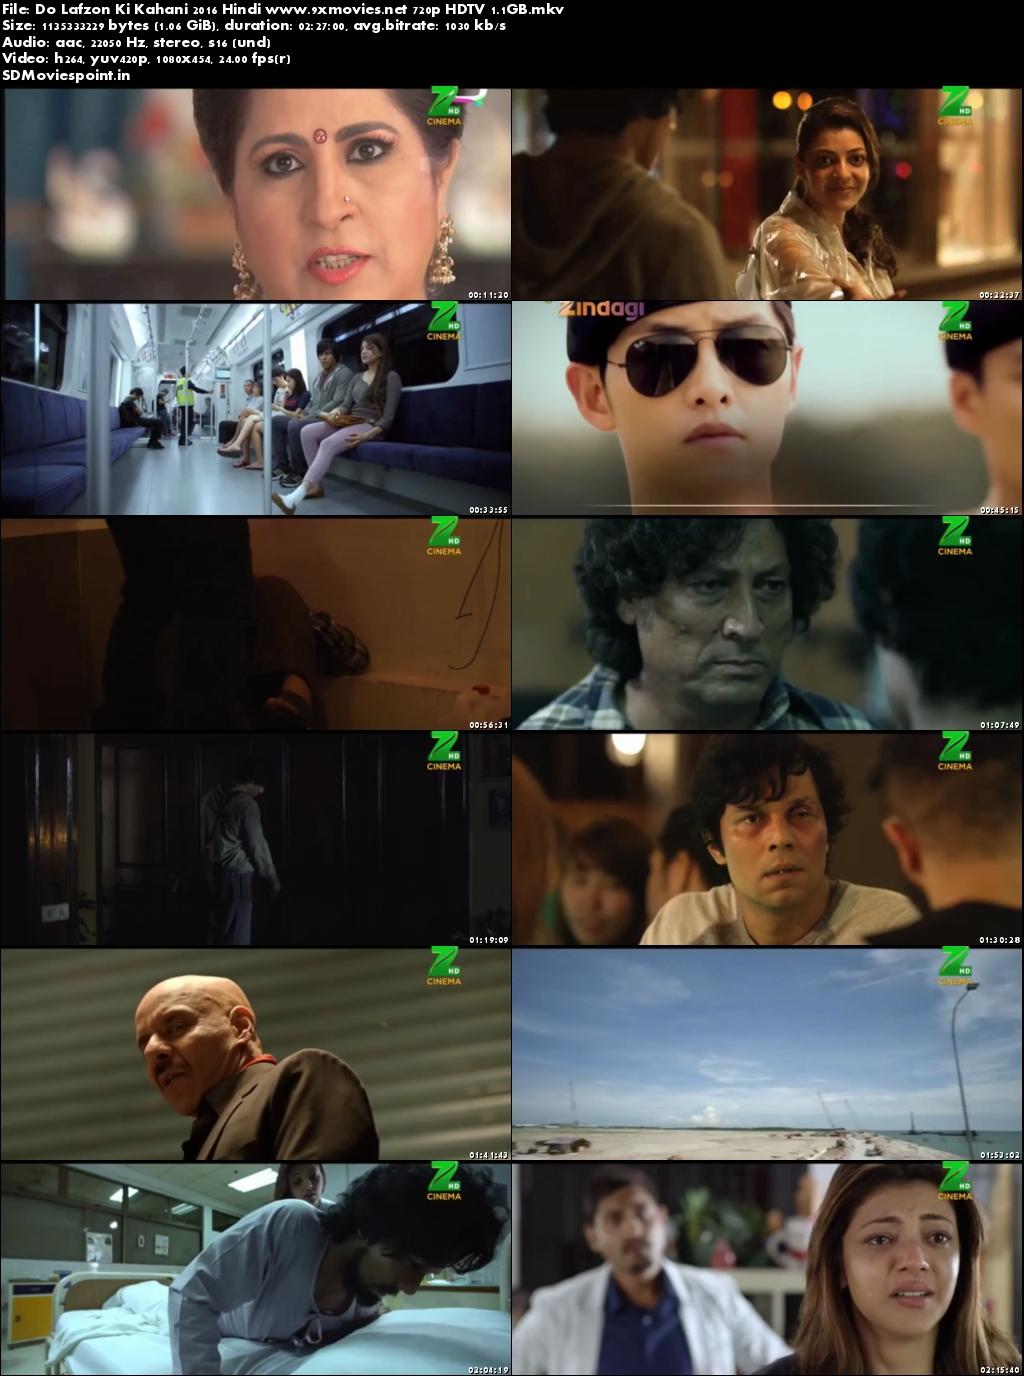 Screen Shots Do Lafzon Ki Kahani (2016) Full Hindi Movie Download 720p